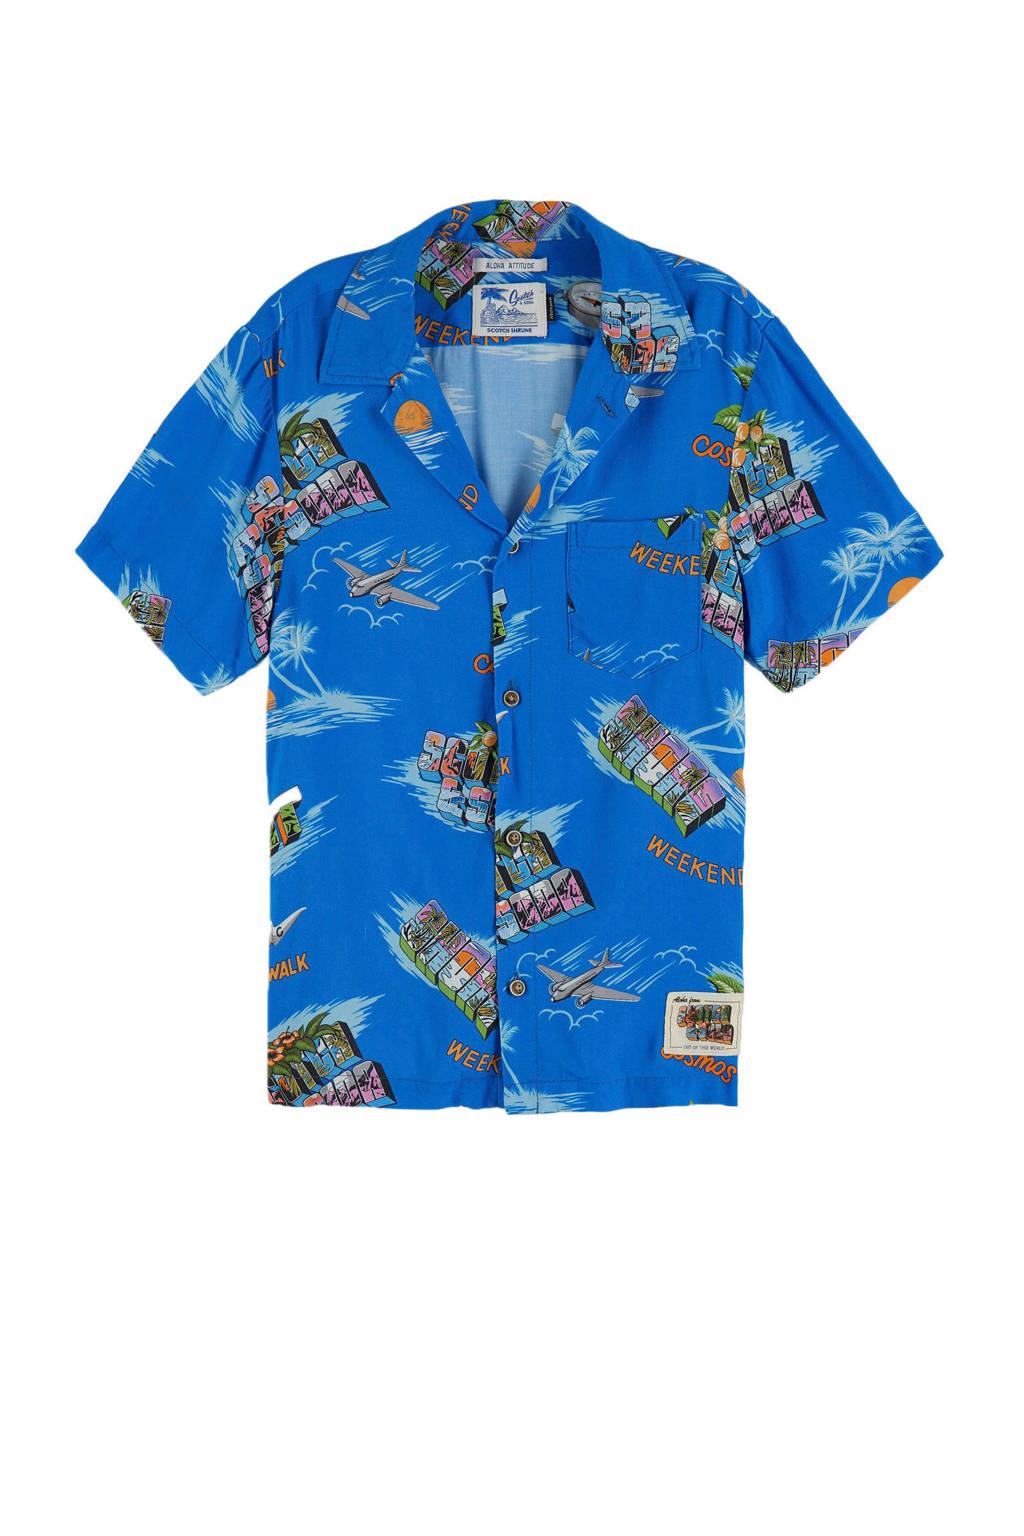 Scotch & Soda overhemd met all over print blauw/multi, Blauw/multi